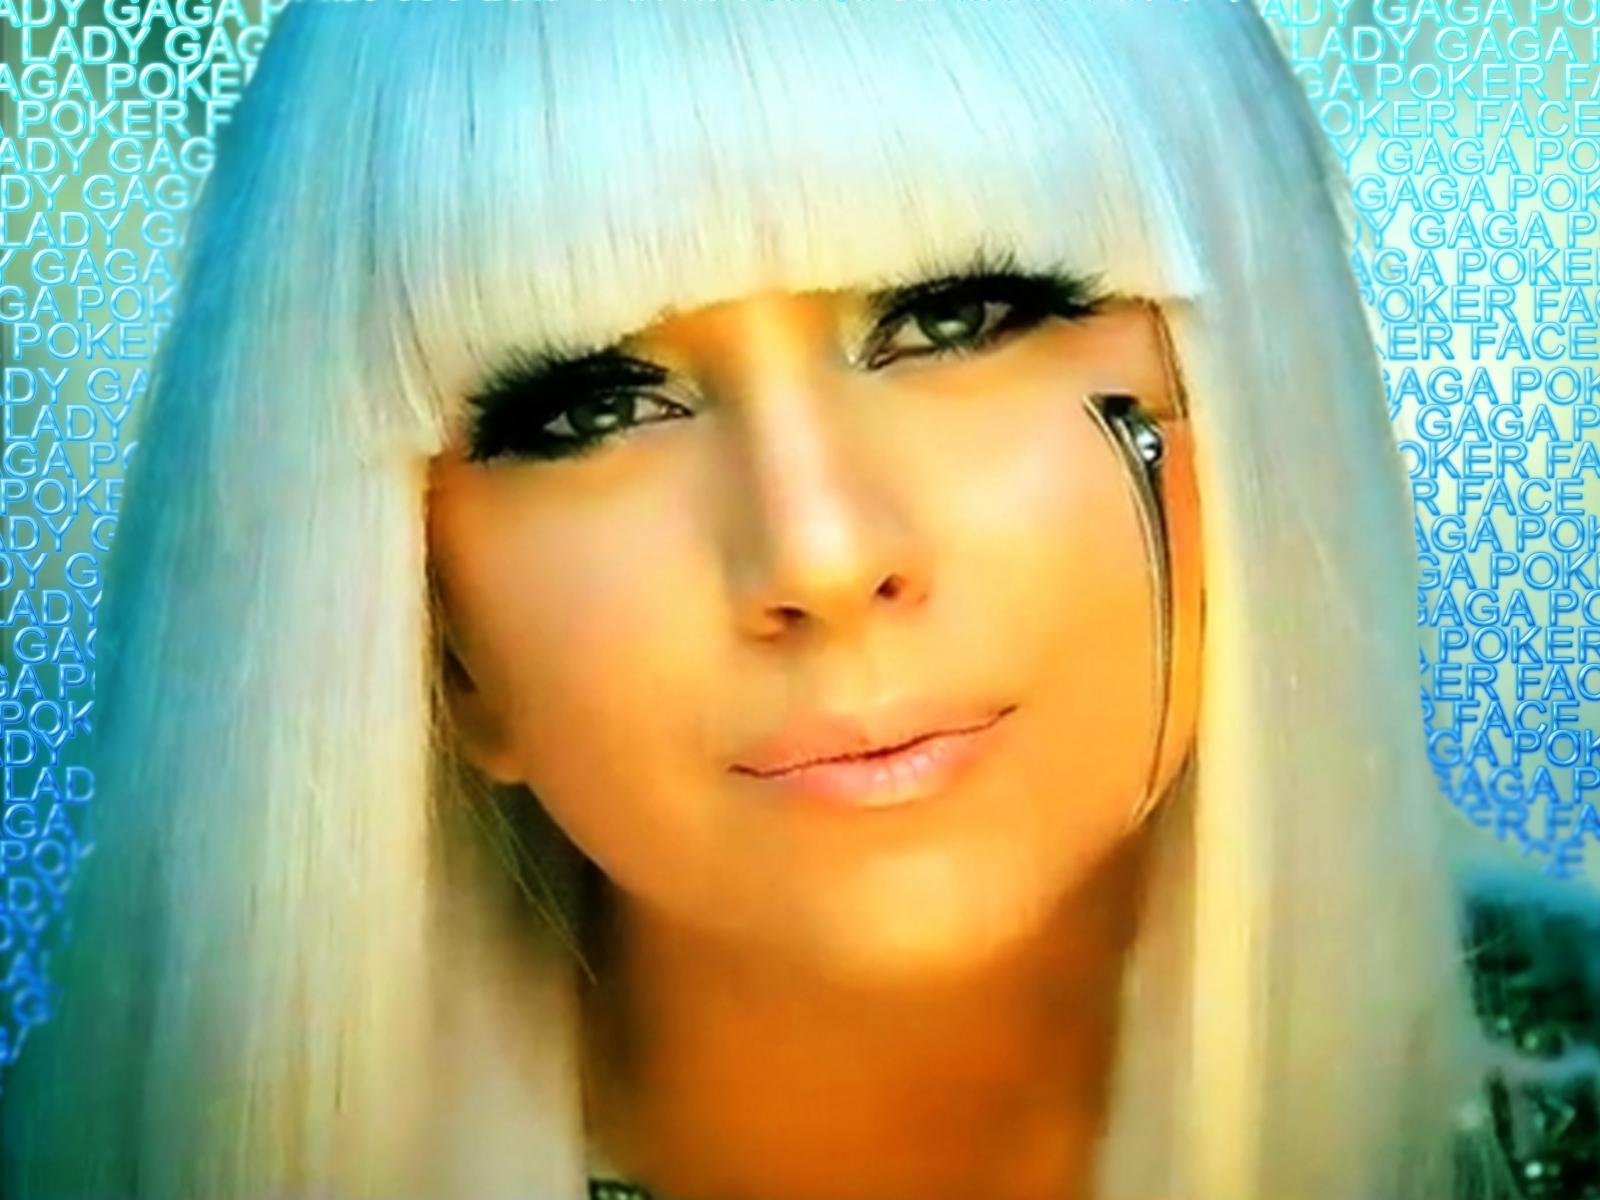 http://1.bp.blogspot.com/-r_a4OnksyHA/TZXGqKeoqnI/AAAAAAAAAuQ/-aak-Sit_vo/s1600/lady+gaga+pictures.jpg